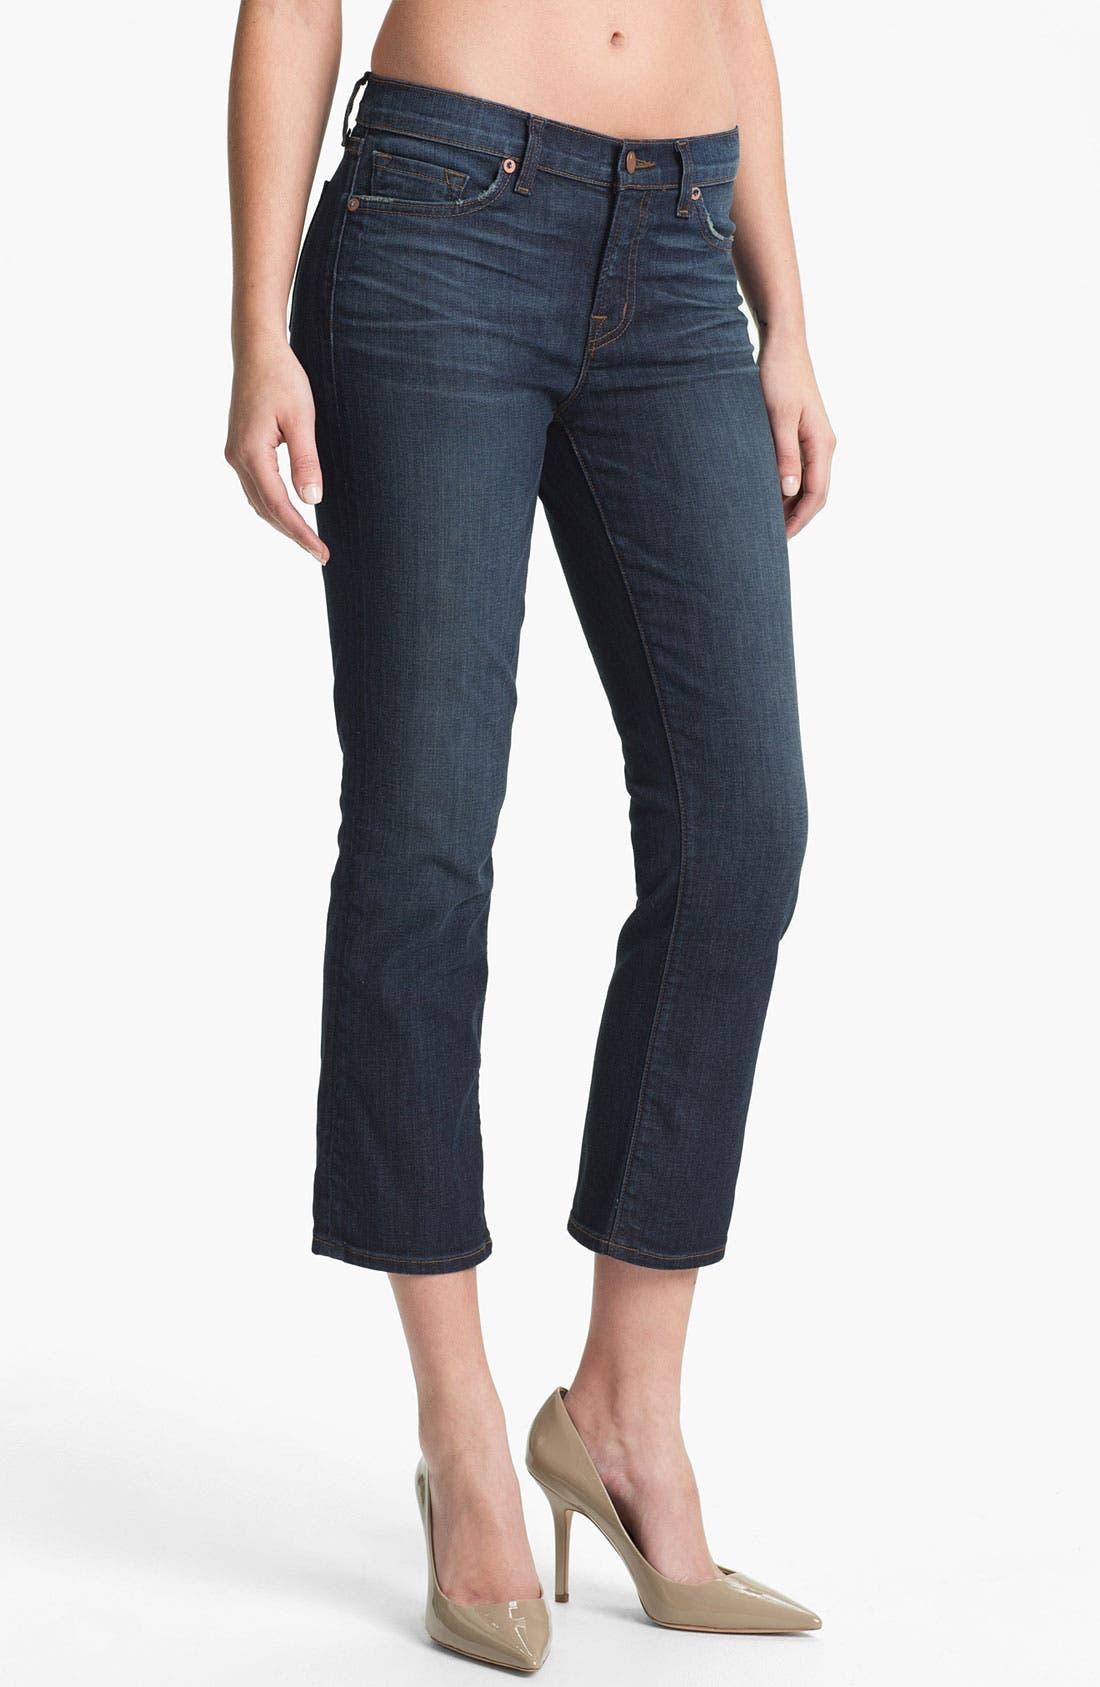 Alternate Image 1 Selected - J Brand 'Sylvie' Crop Flare Leg Jeans (East Wick)